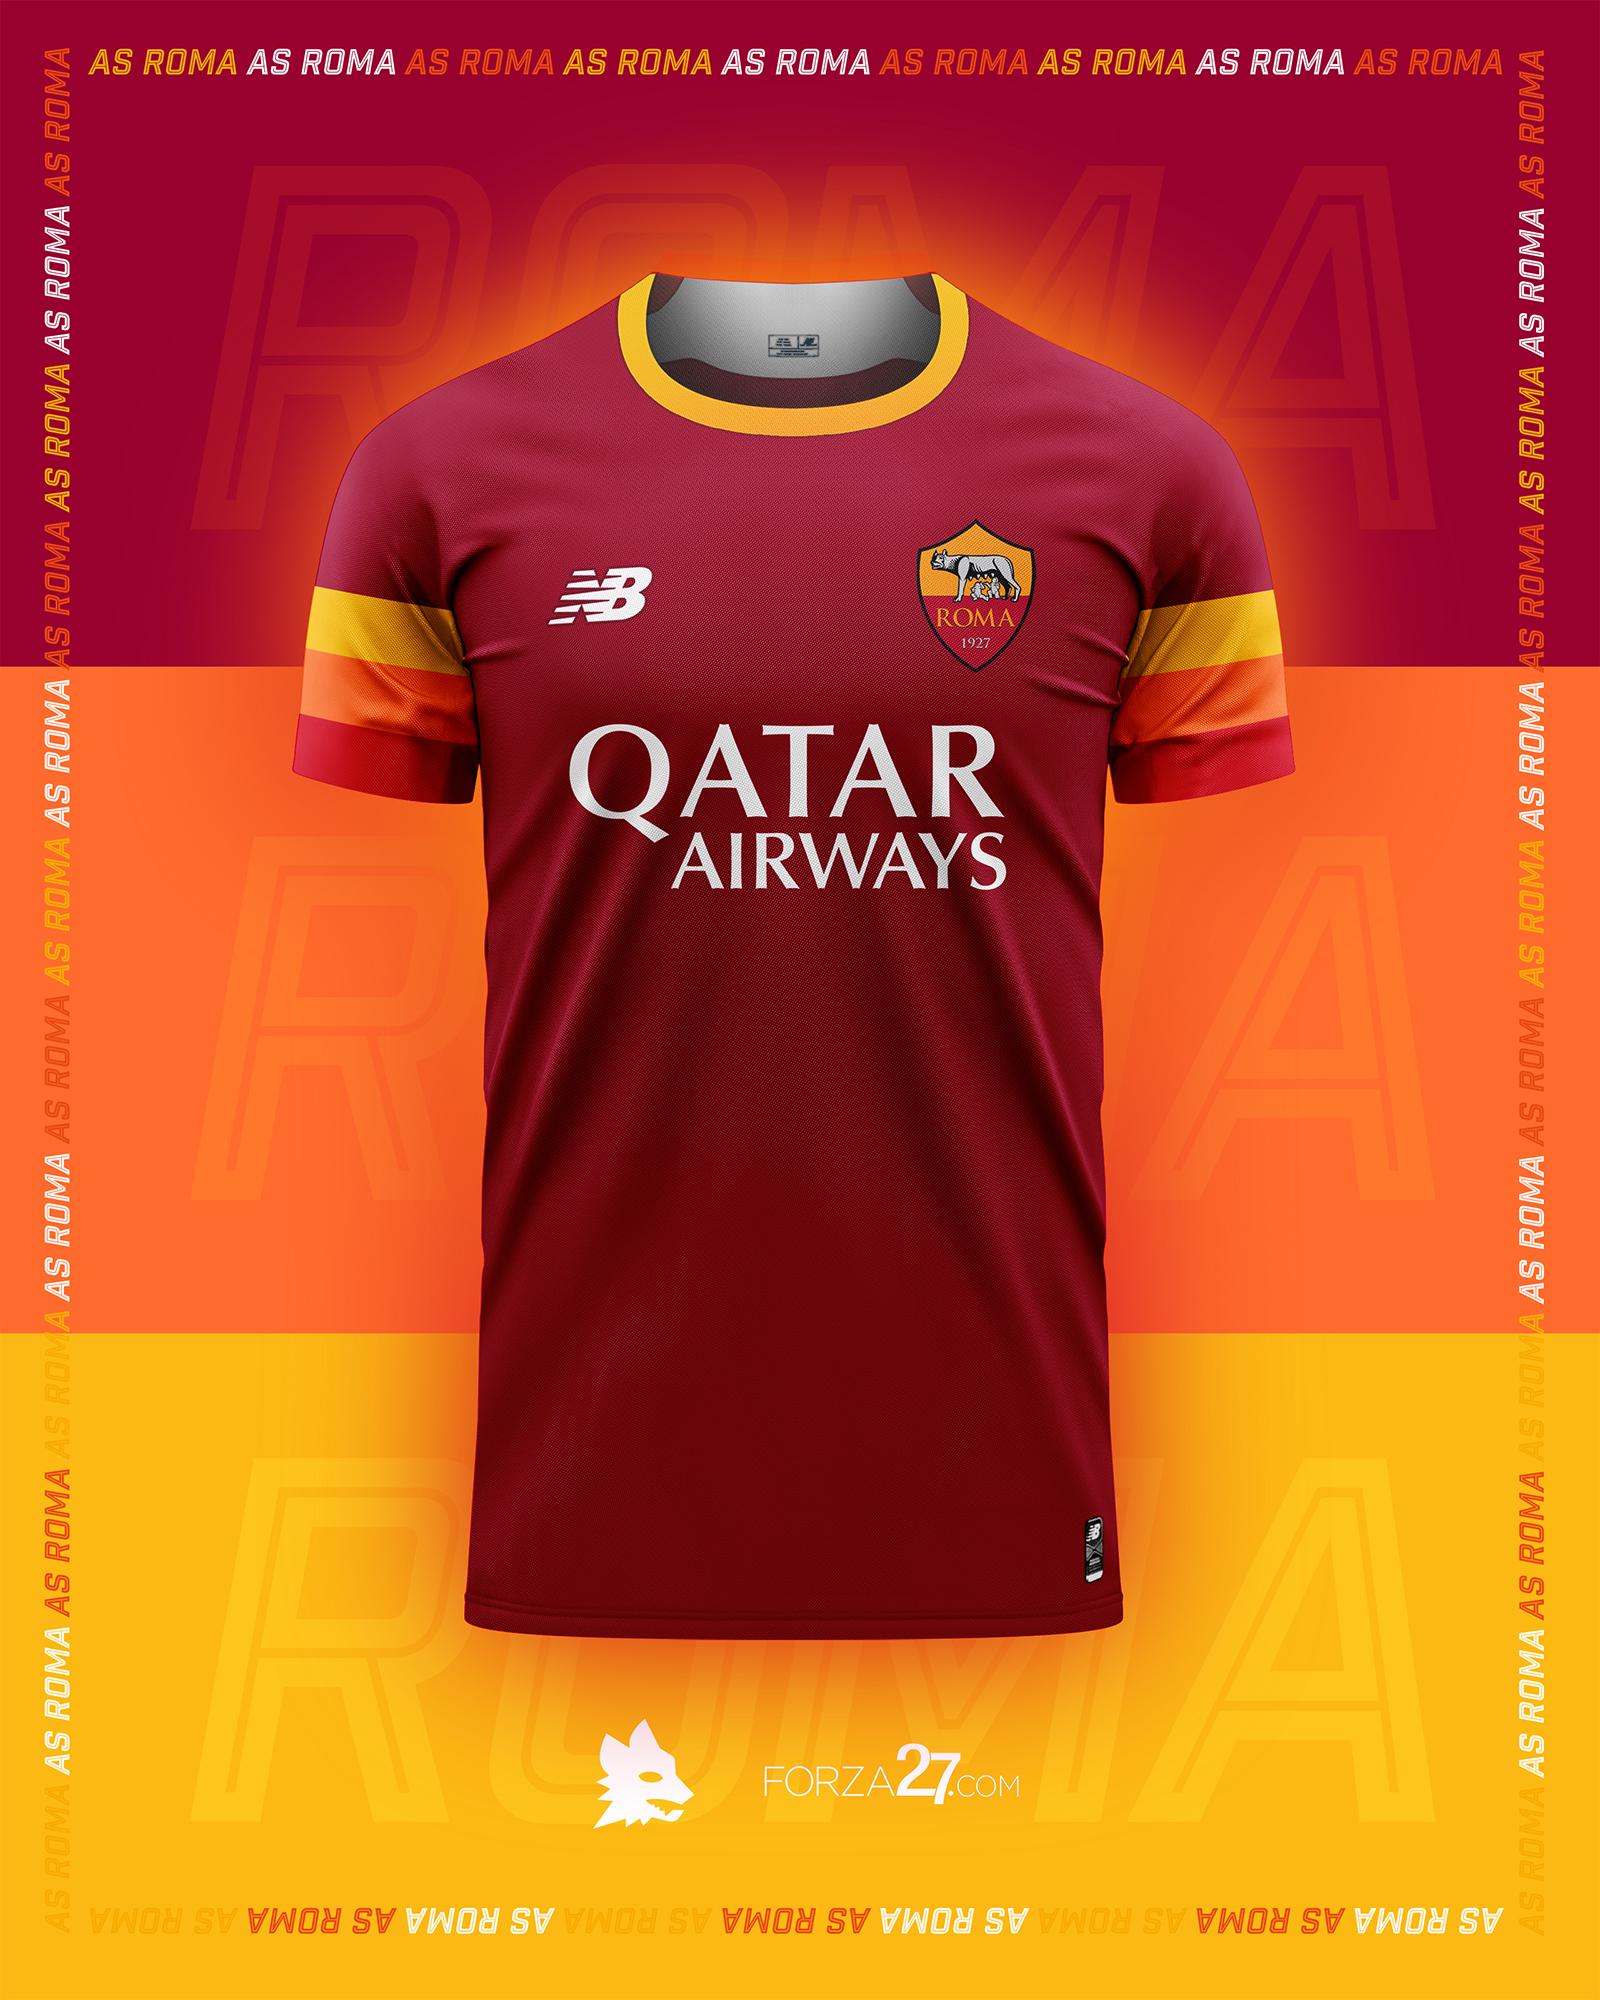 AS Roma x New Balance Kit Concepts – Forza27